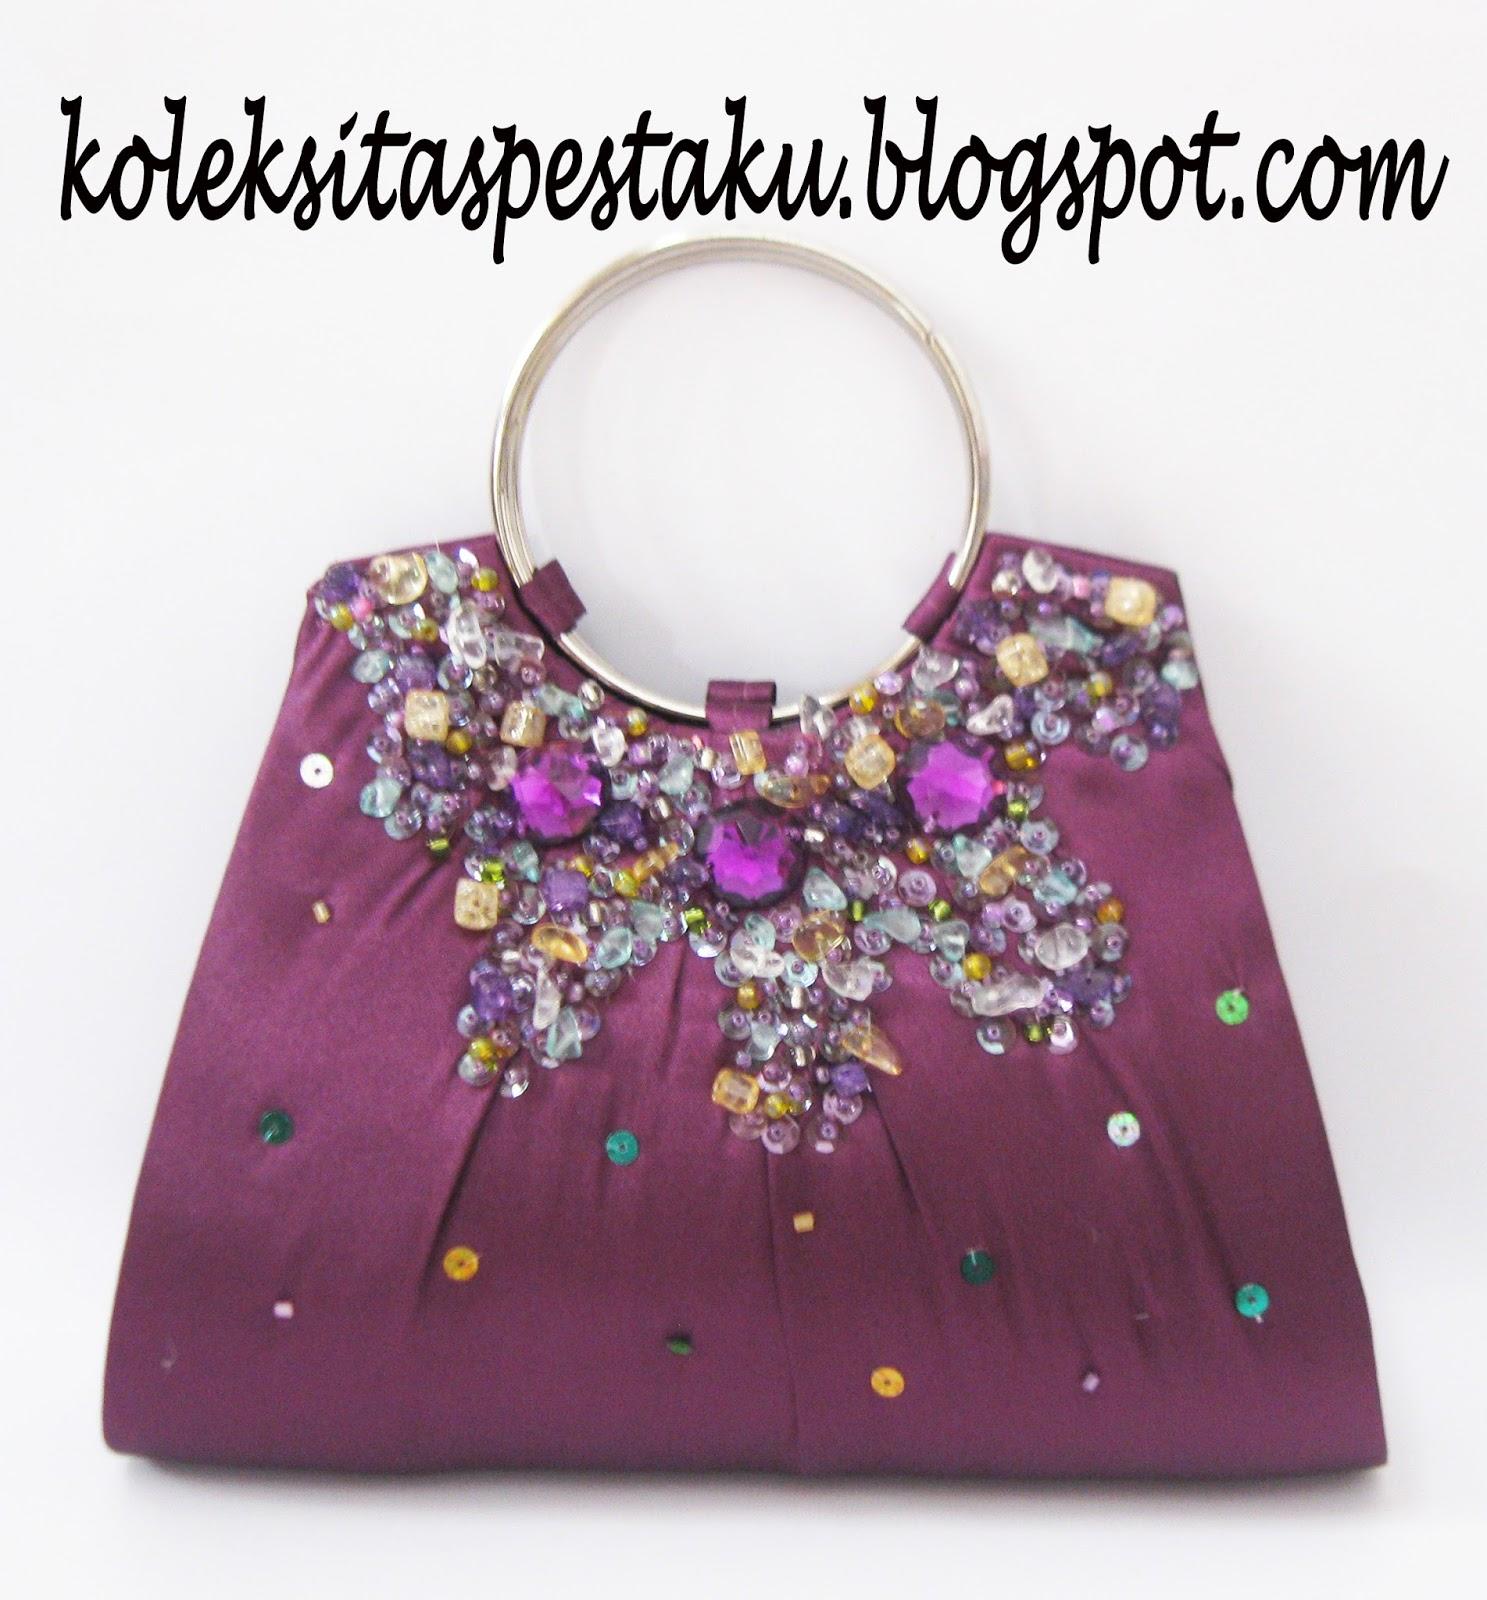 Tas Pesta - Clutch Bag  taspestaku  Jual Handmade Tas Pesta Ungu ... 19d7965181